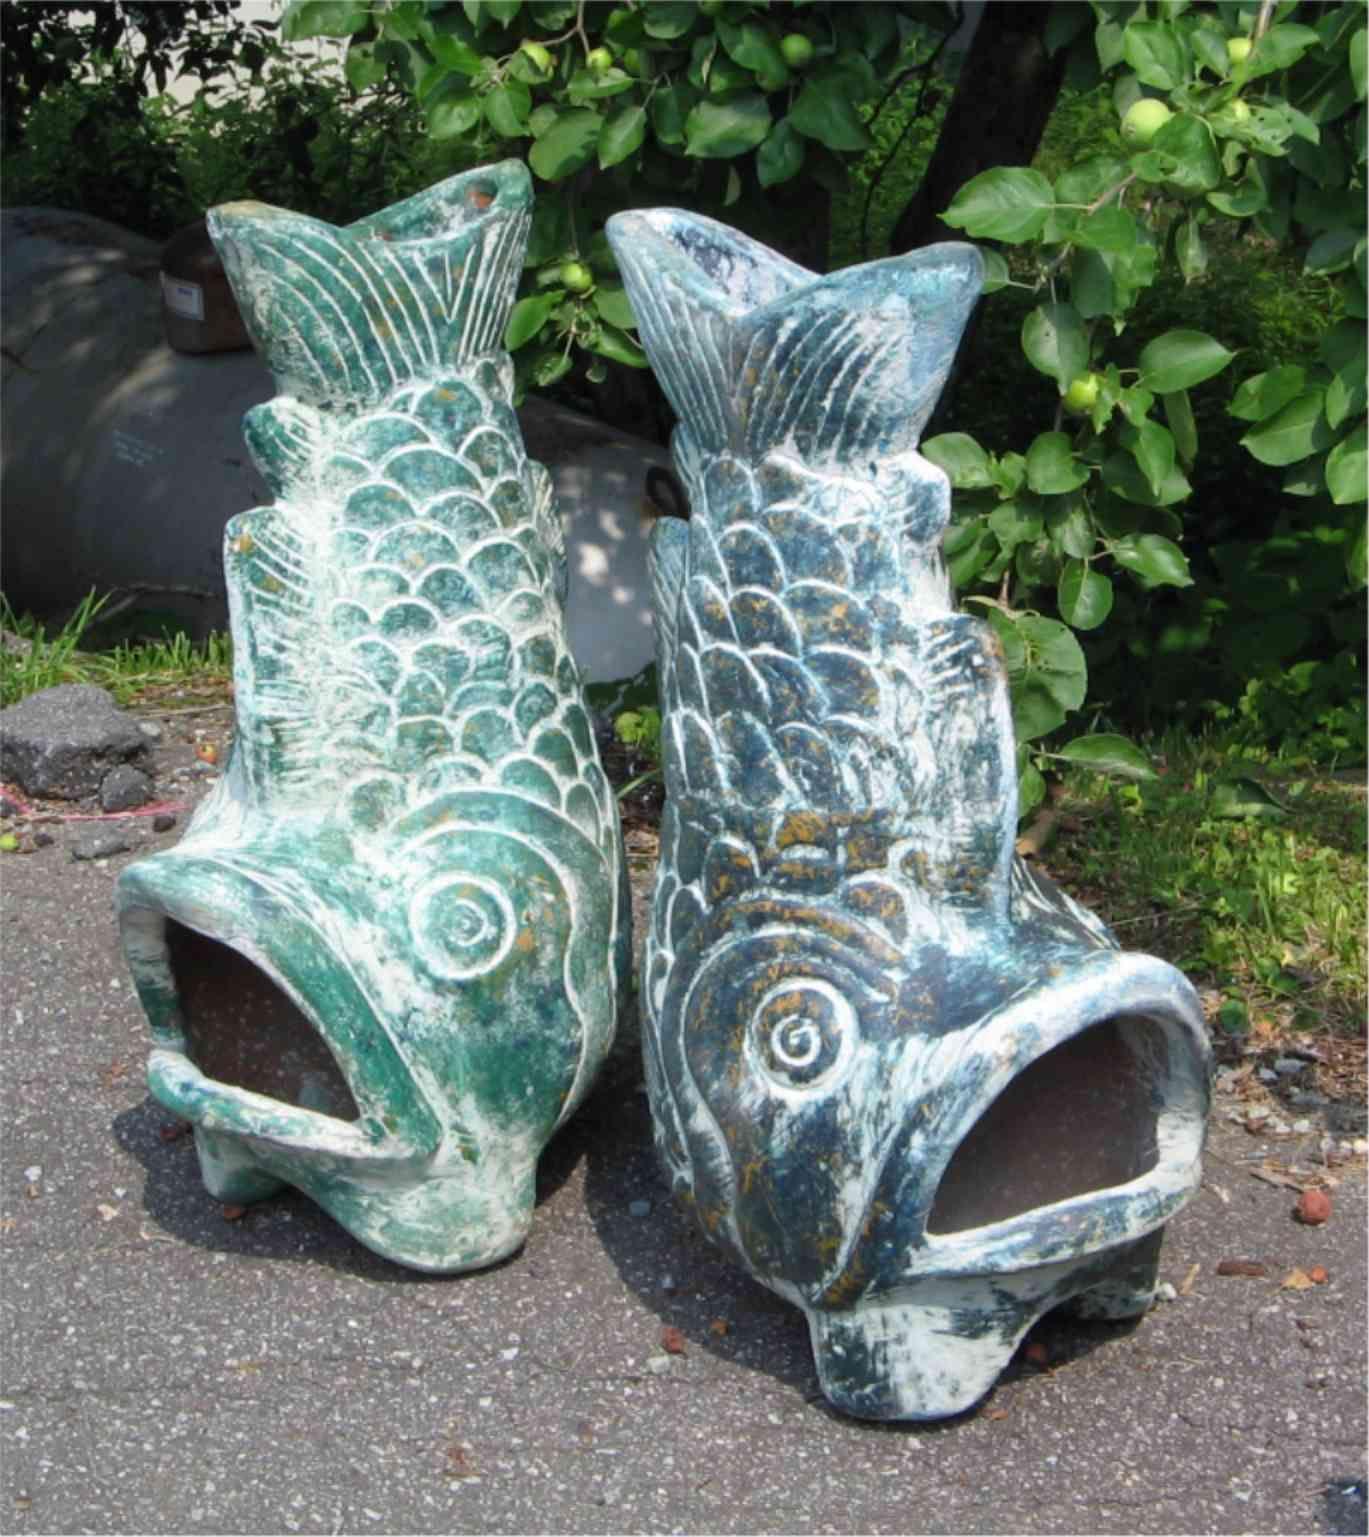 fish chiminea modified mexican clay design i broke mine looking